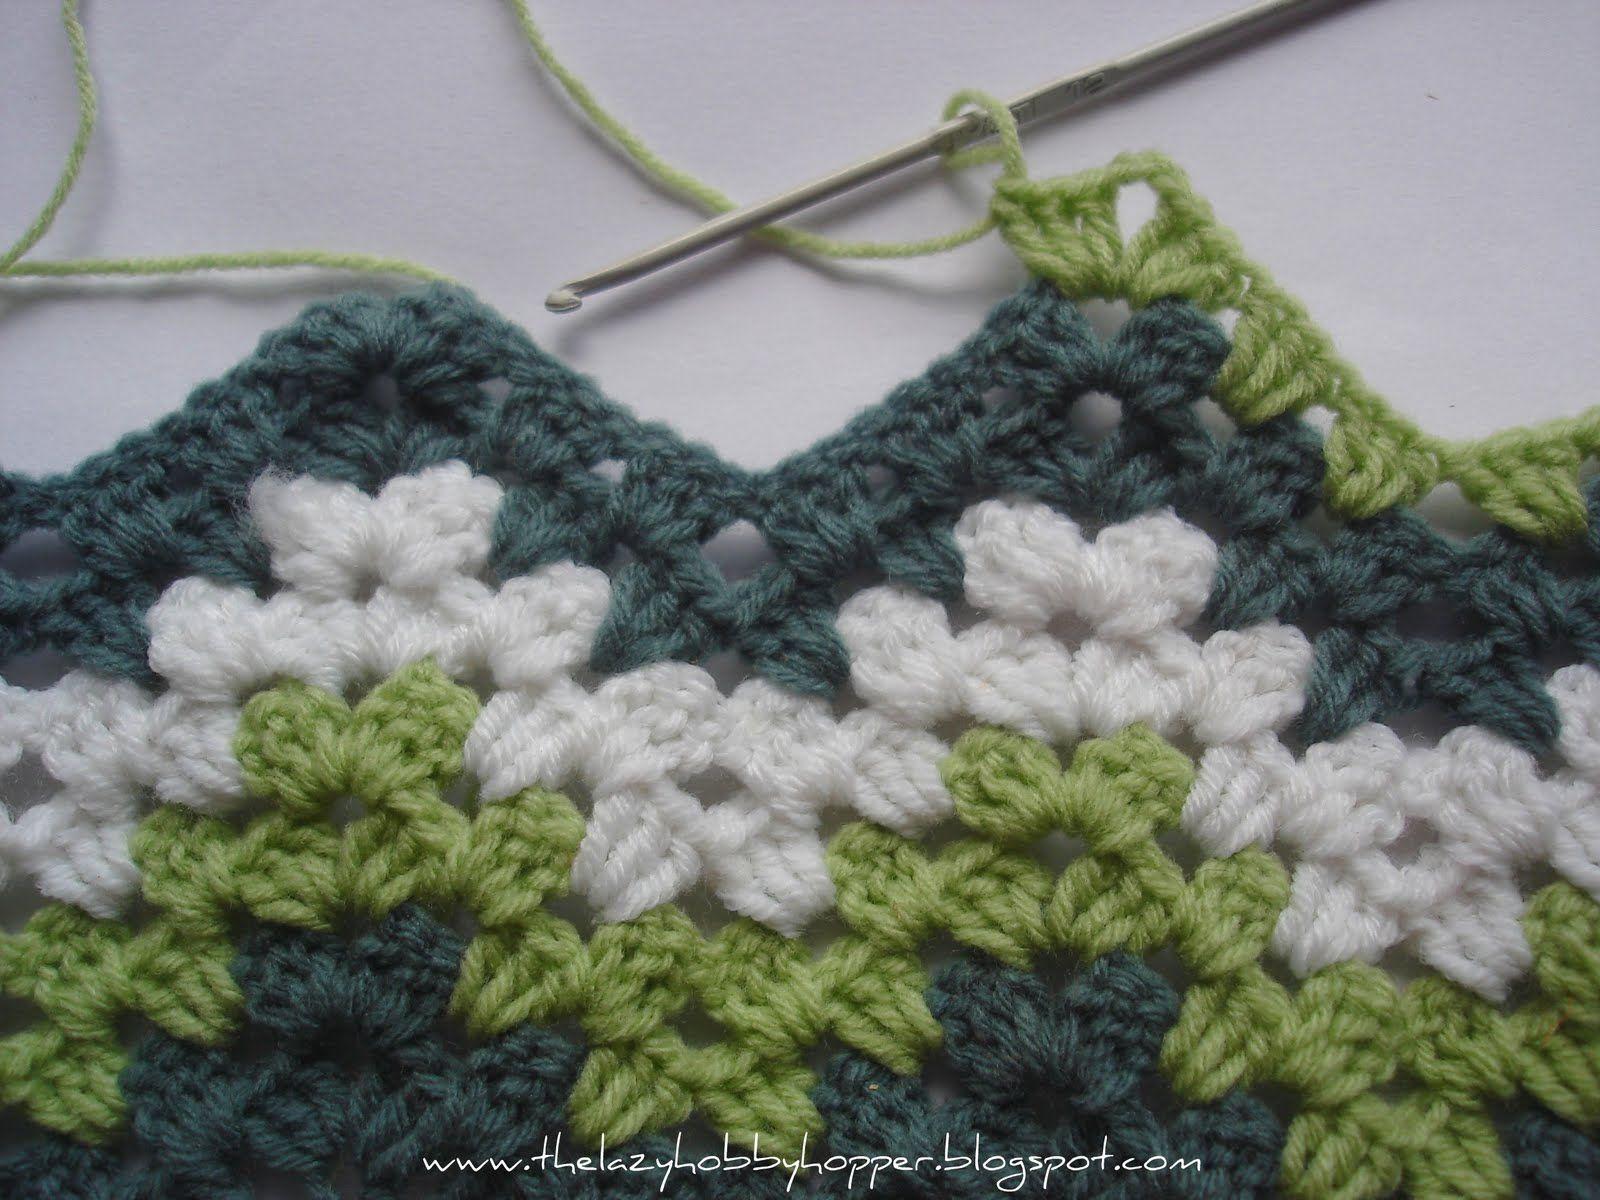 Crochet Granny Ripple | Crochet | Pinterest | Crochet granny, Lazy ...